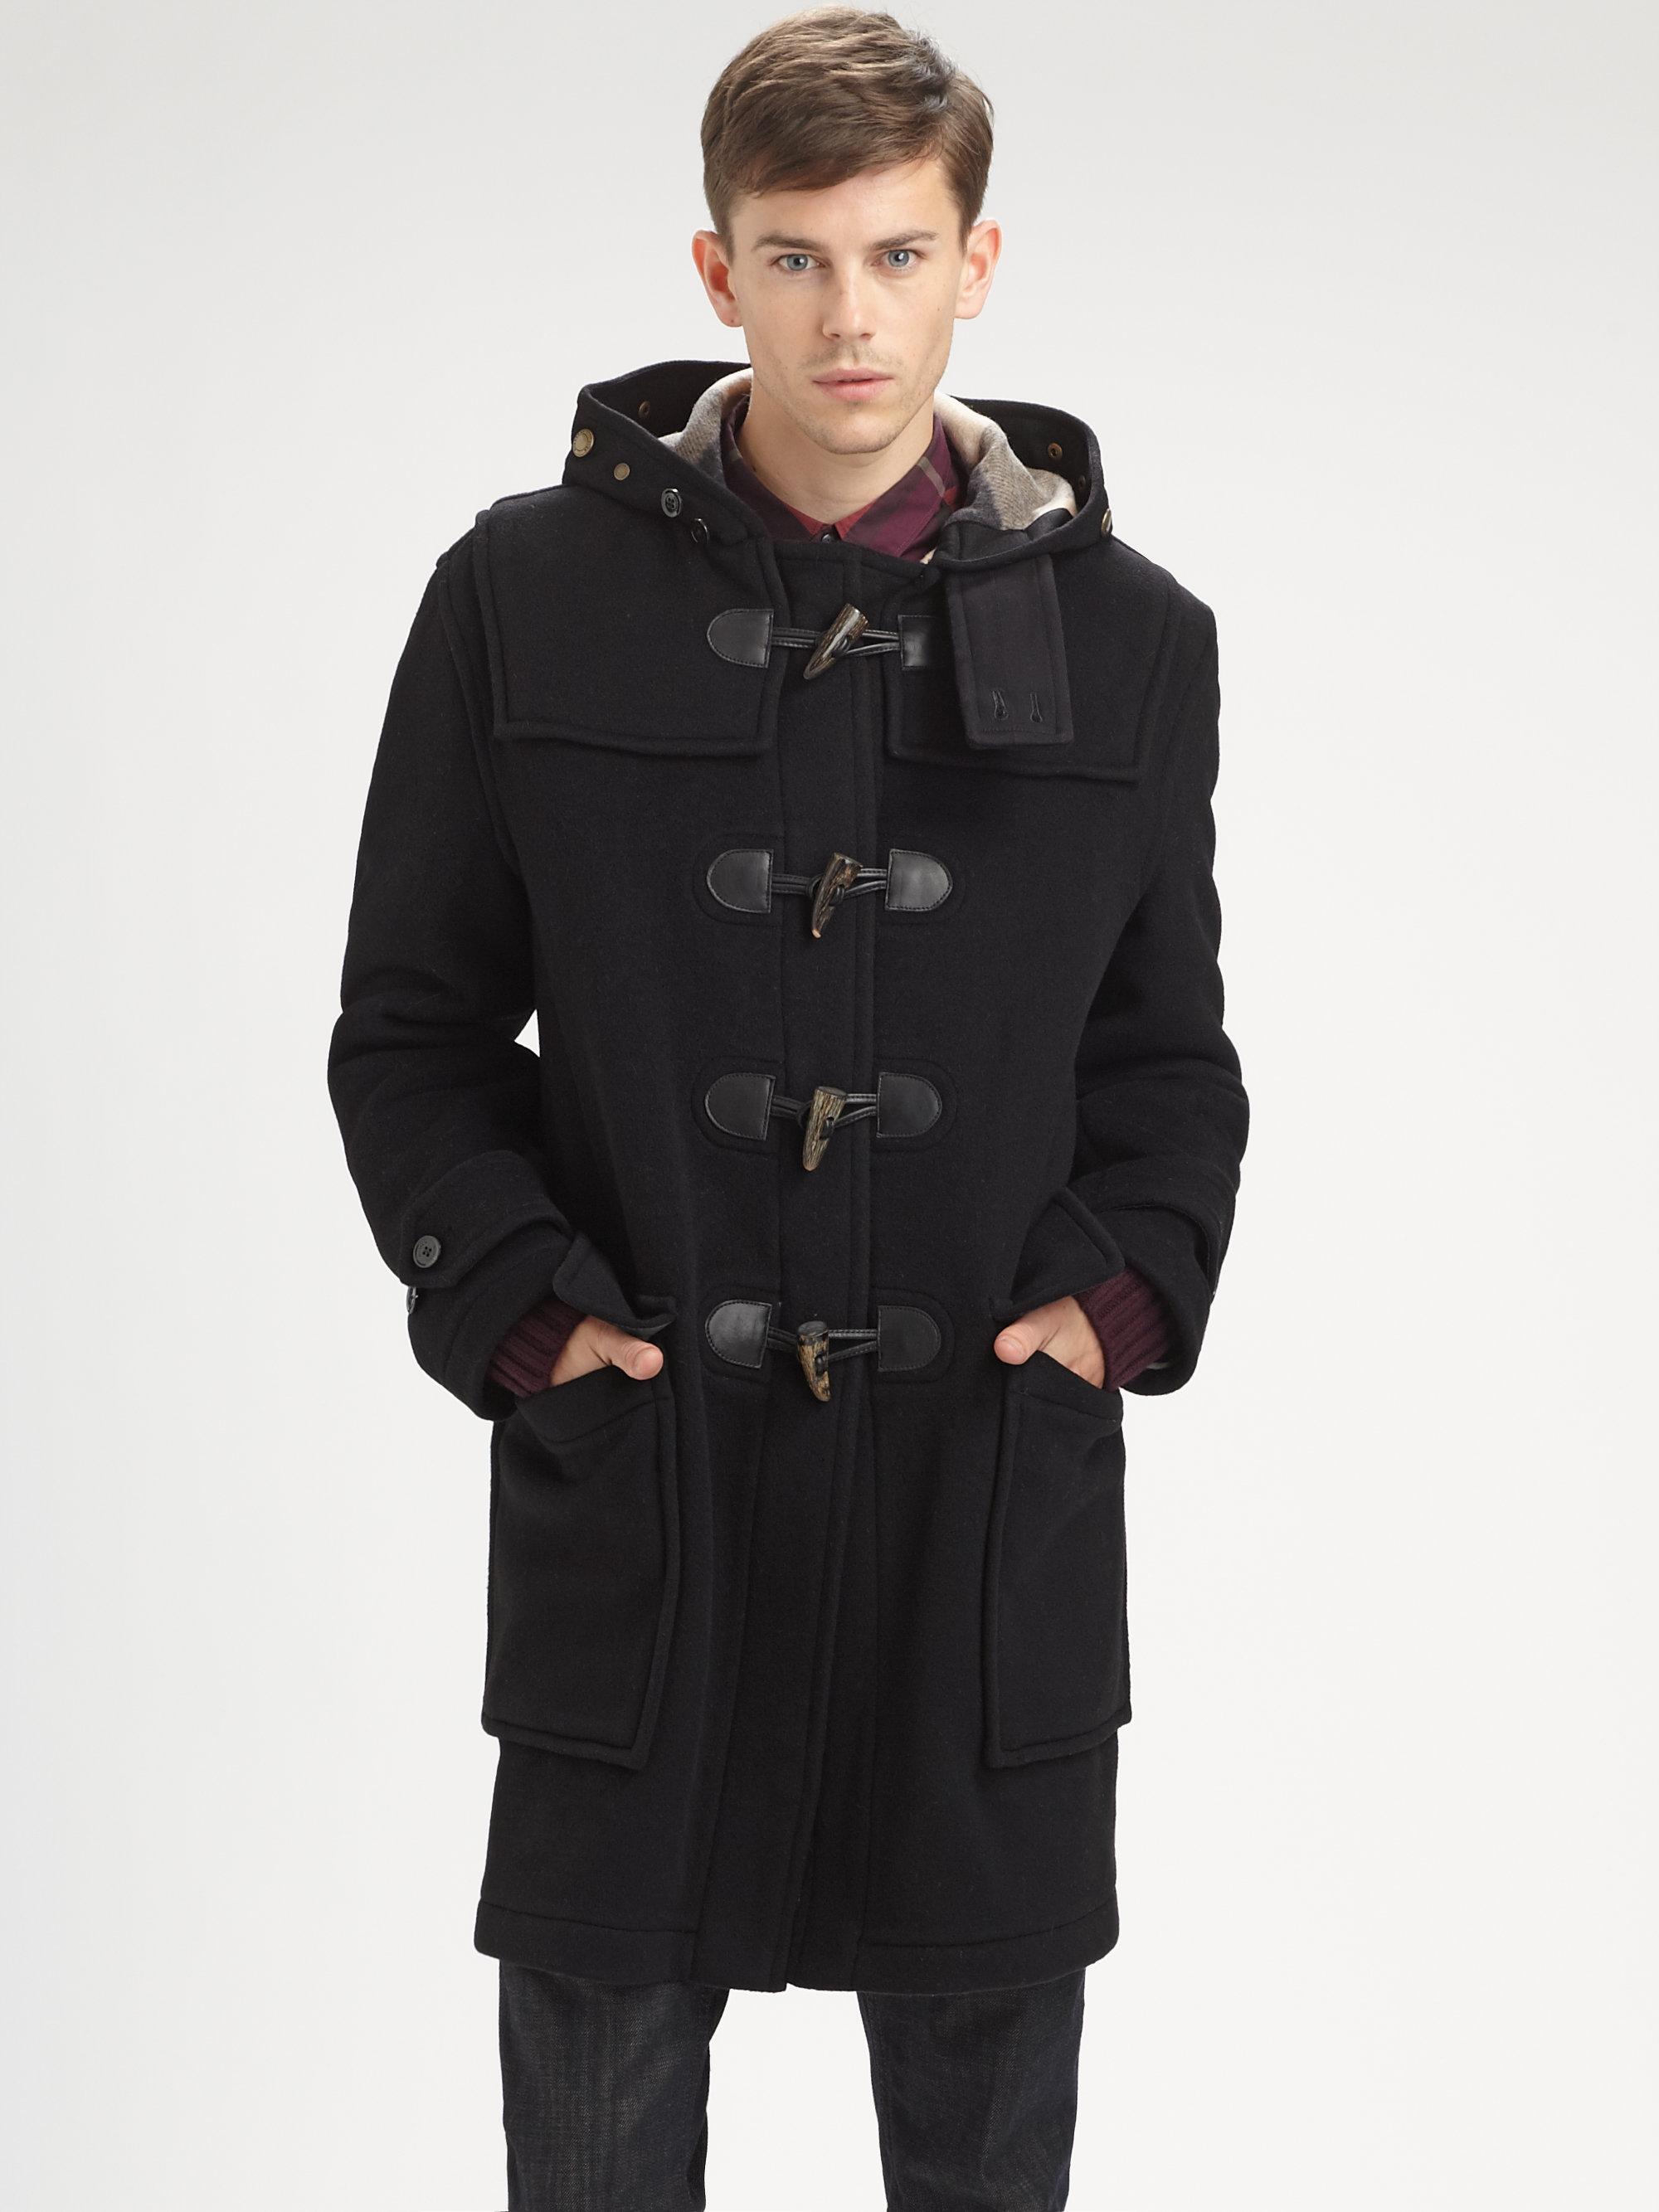 Burberry Brit Duffle Coat In Black For Men Lyst